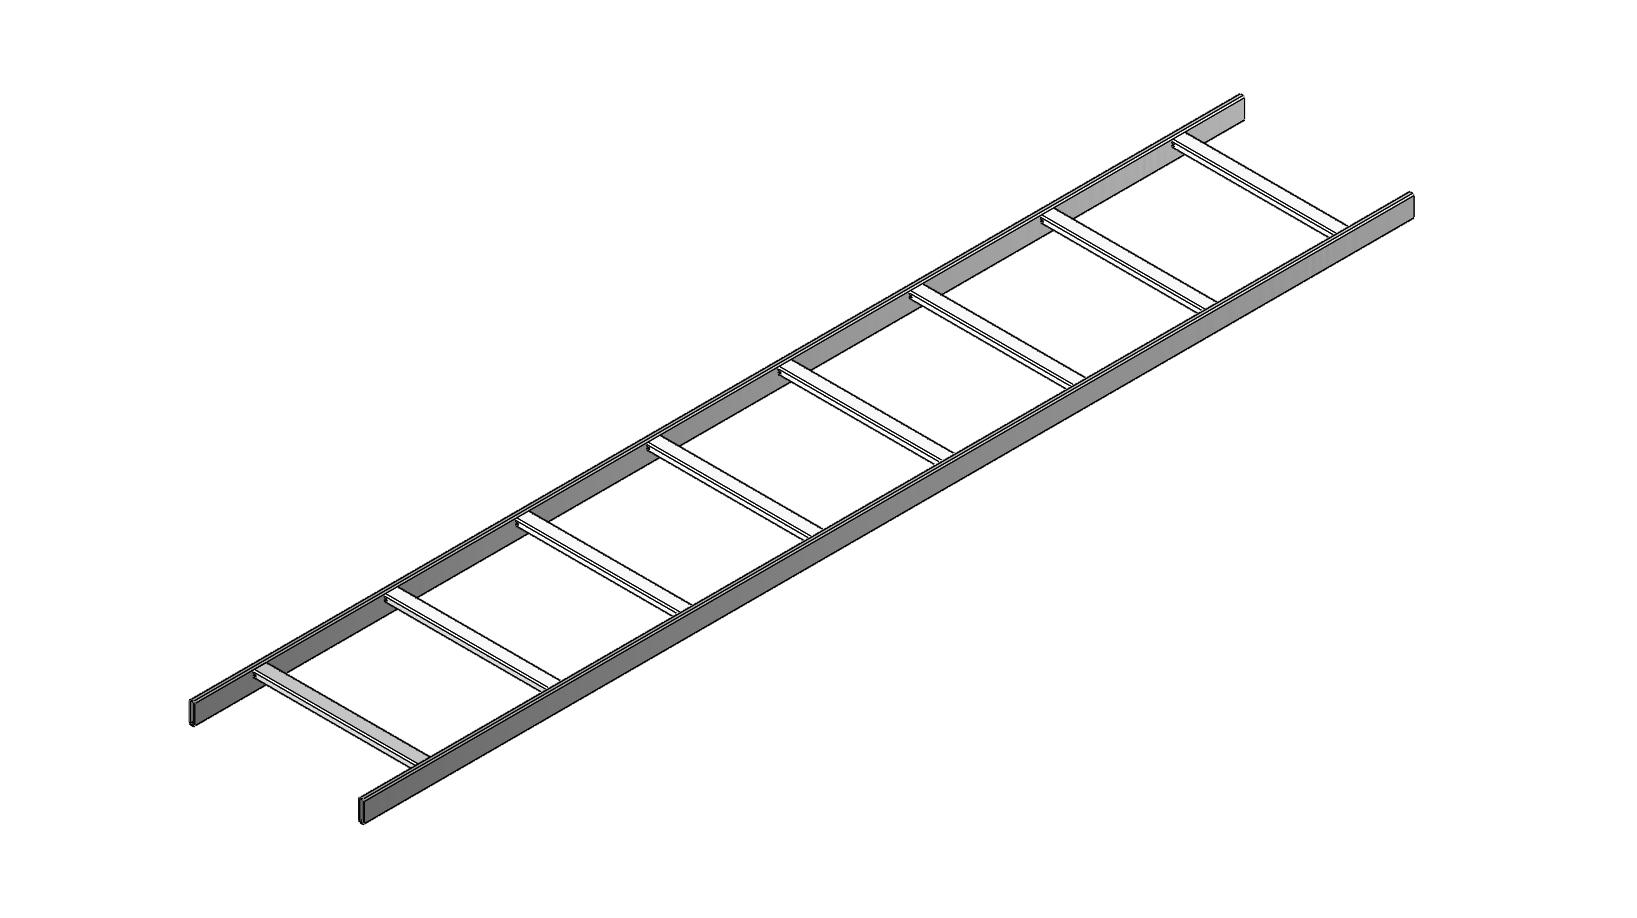 Section I - Ladder Rack